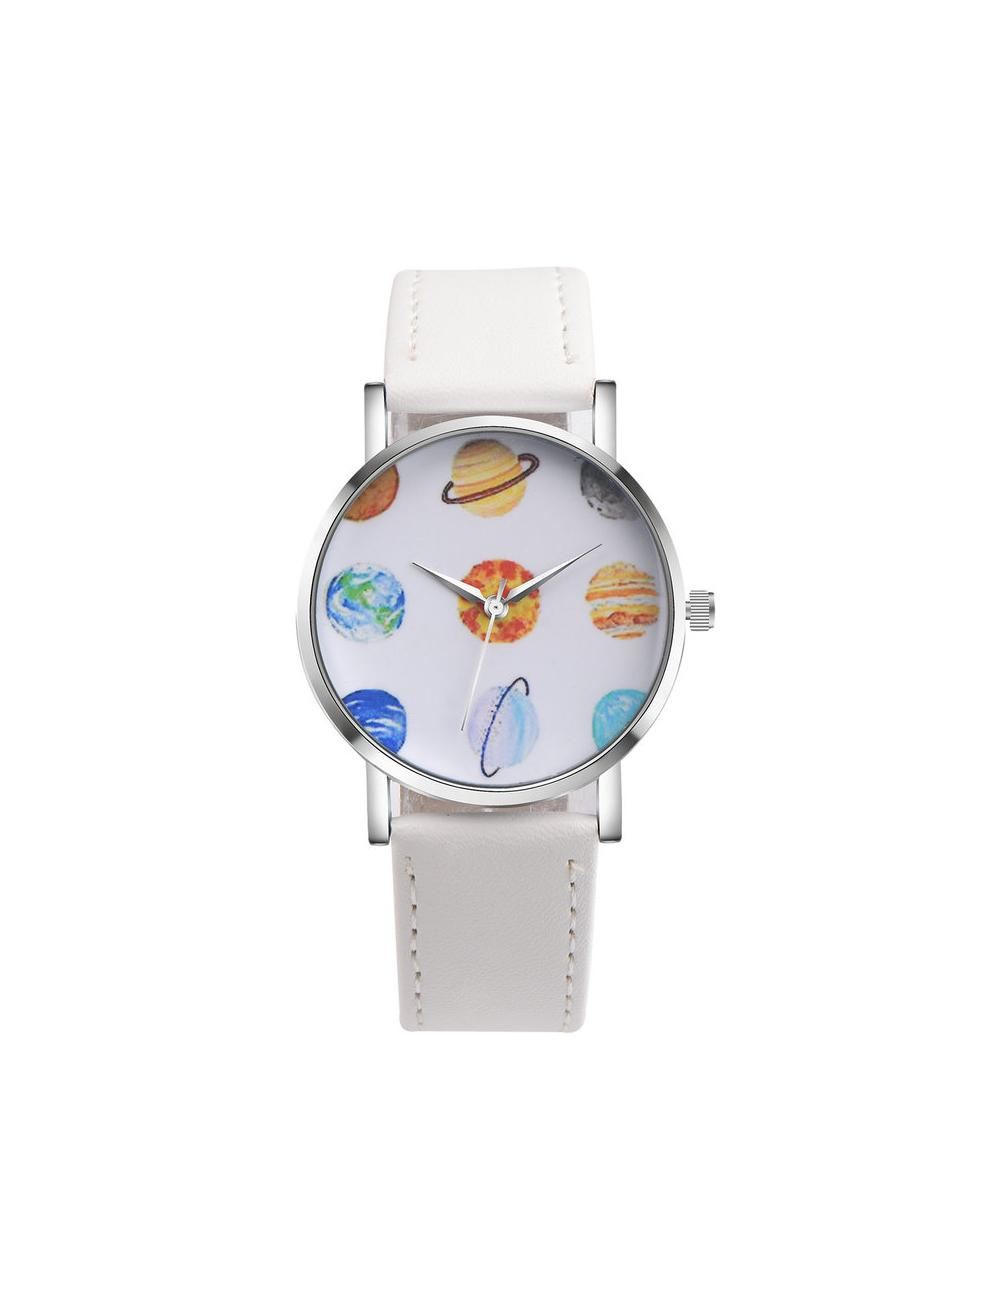 Reloj Planetas Dayoshop $31.900